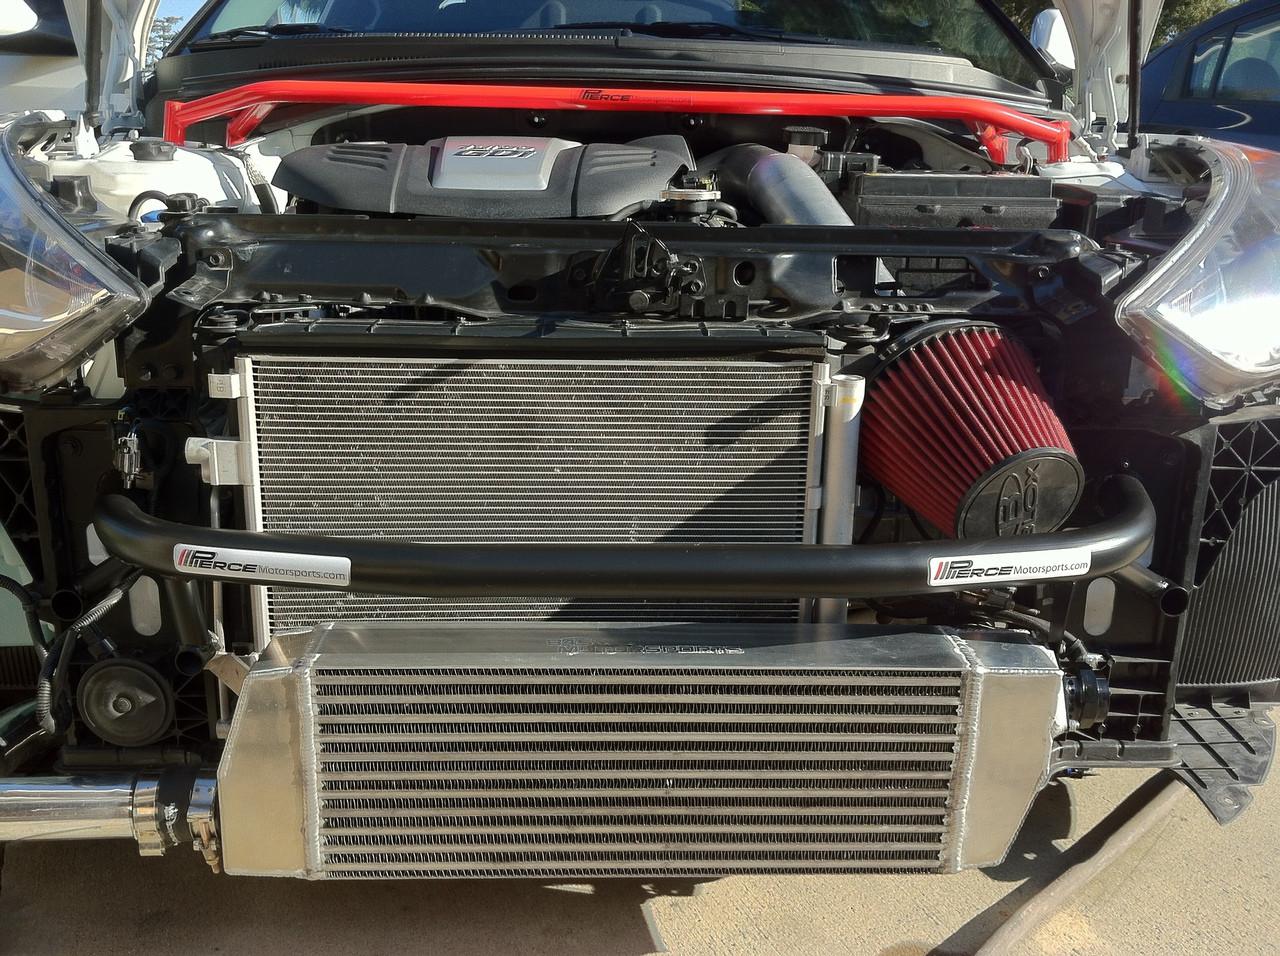 2012 2018 hyundai veloster turbo tubular crashbar with ic relocation Hyundai Veloster Wiring Harness